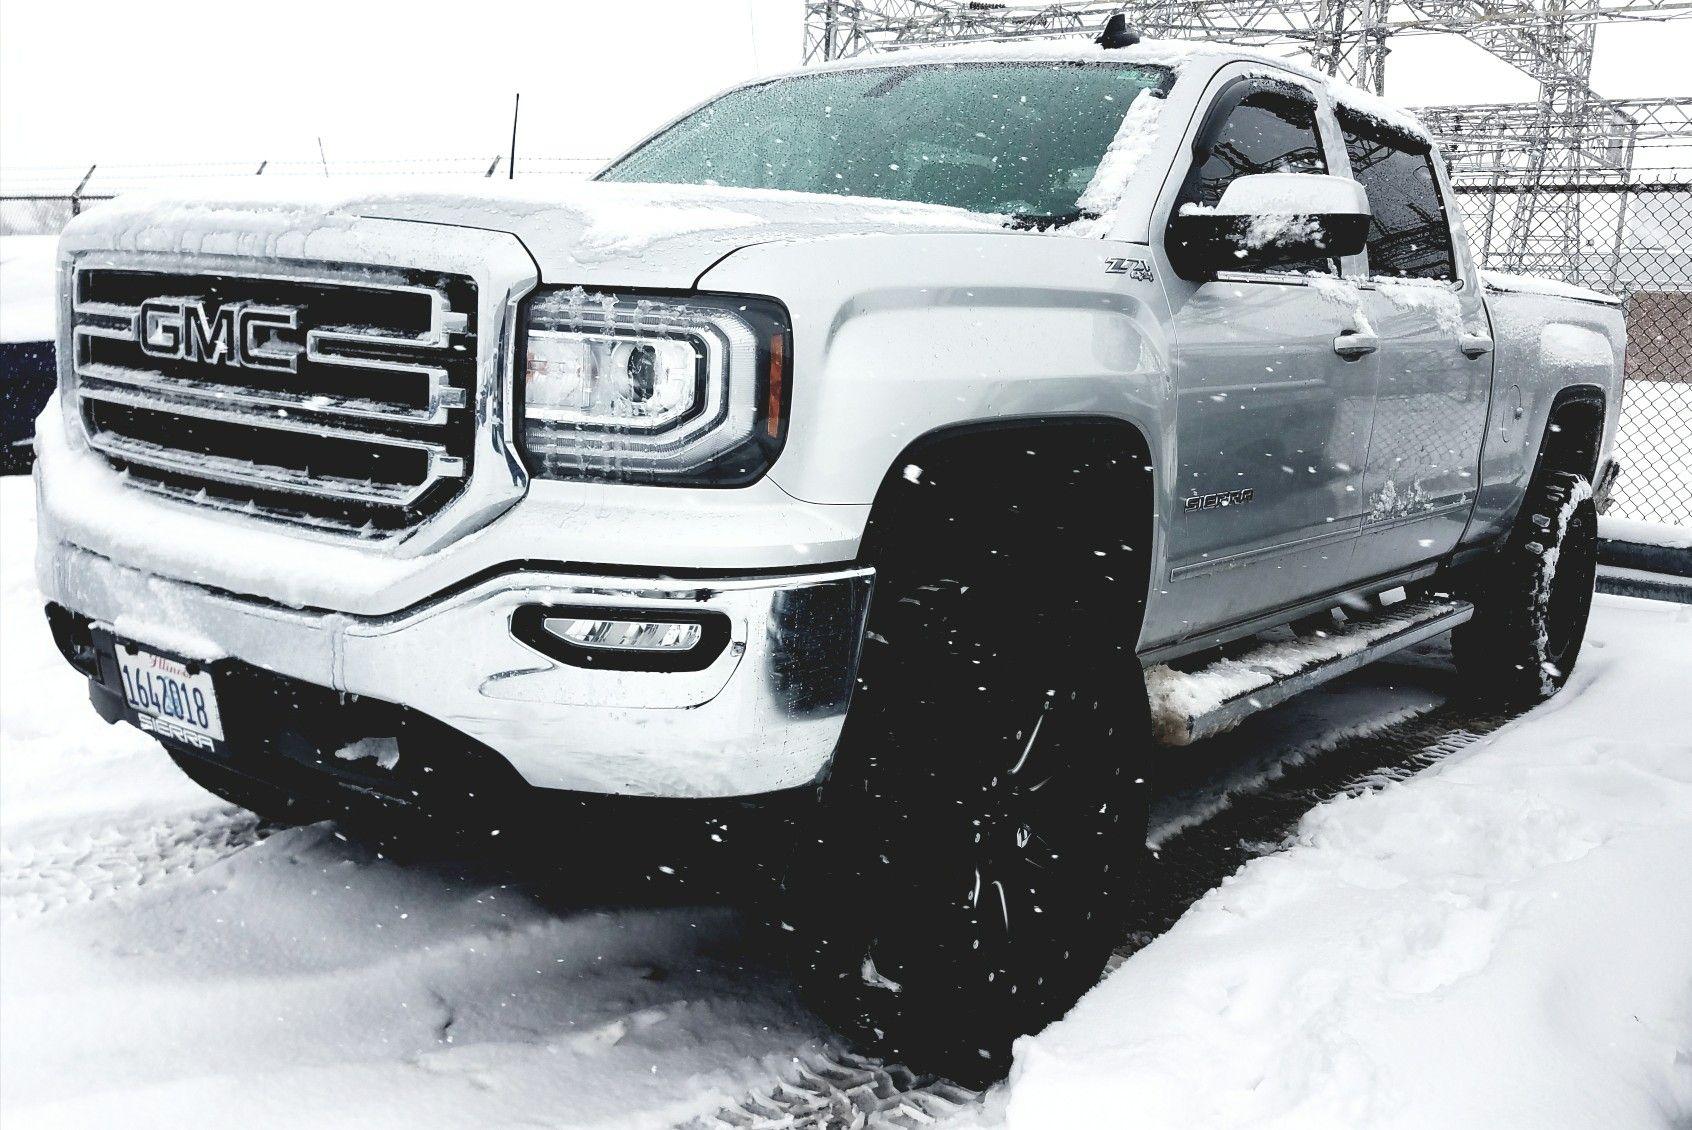 2016 Gmc Sierra 1500 Jacked Up Trucks Trucks Chevy Trucks